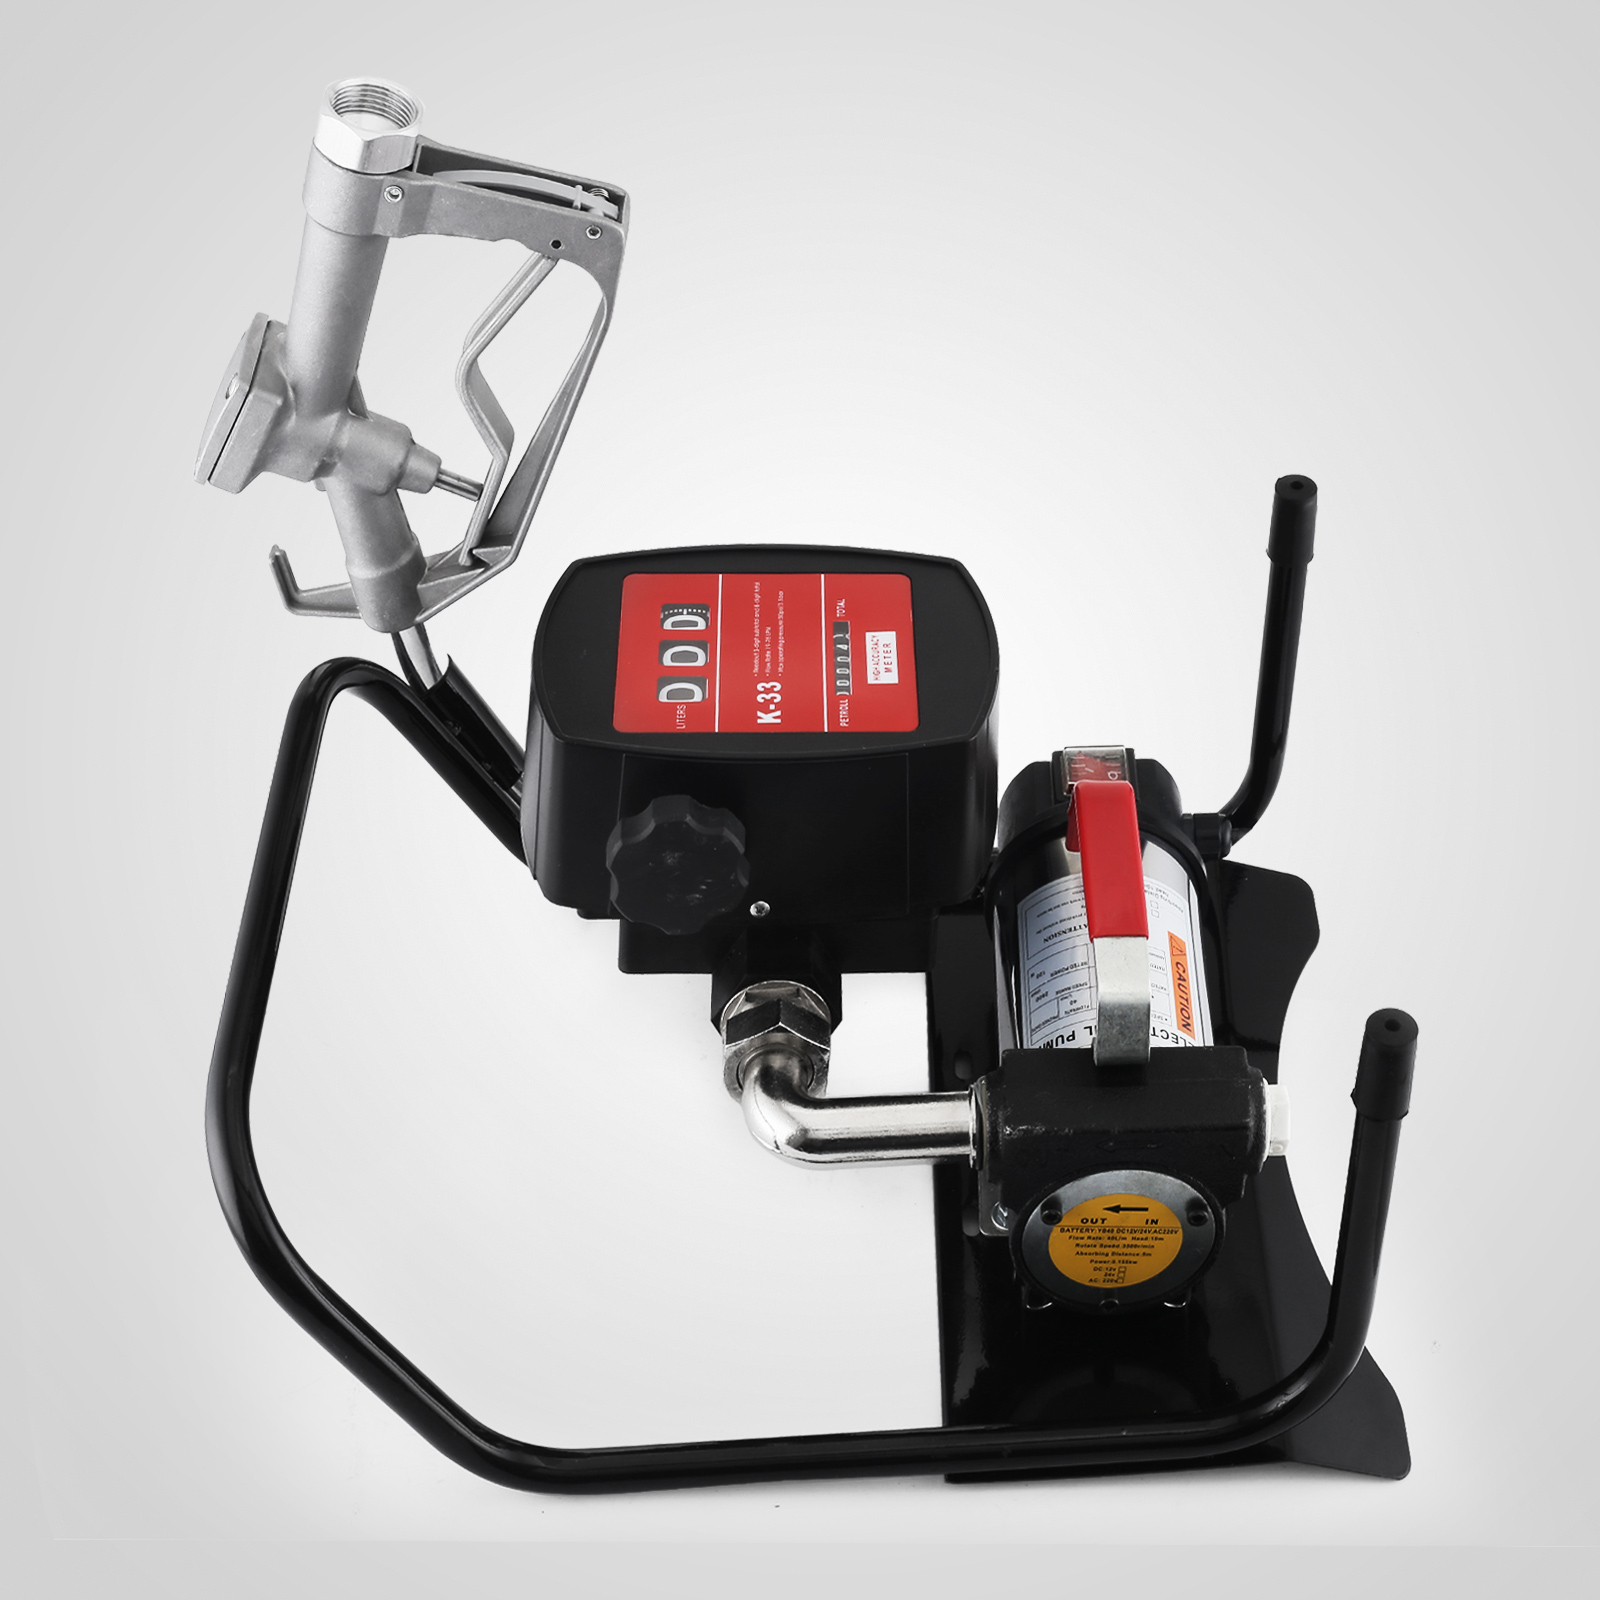 220v dieselpumpe mit z hlwerk heiz lpumpe diesel tankstelle selbstansaugend ebay. Black Bedroom Furniture Sets. Home Design Ideas